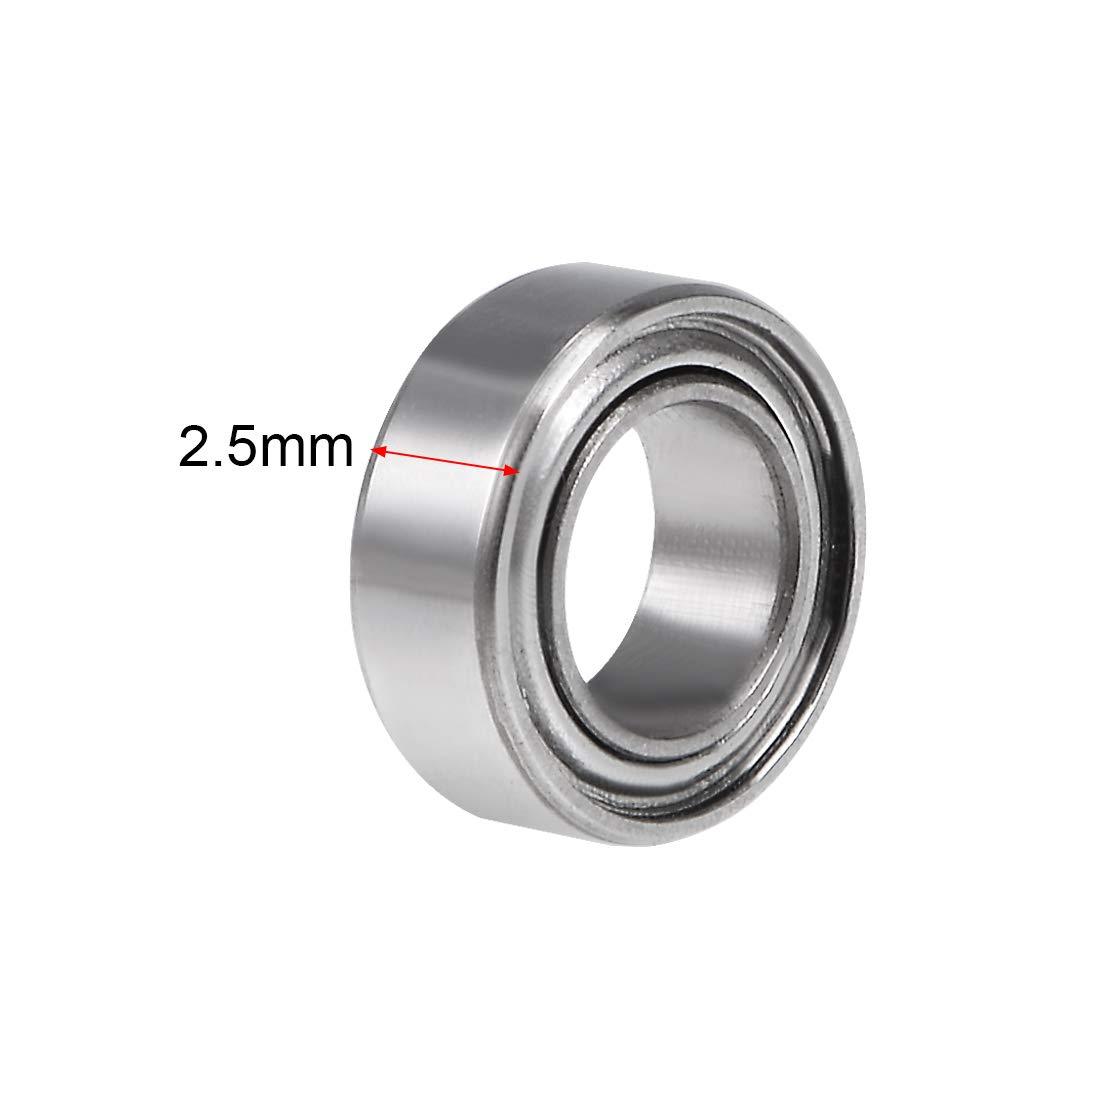 4x7x2.5mm Ball Bearings SMR74ZZ 10pcs Stainless Steel Deep Groove Bearings